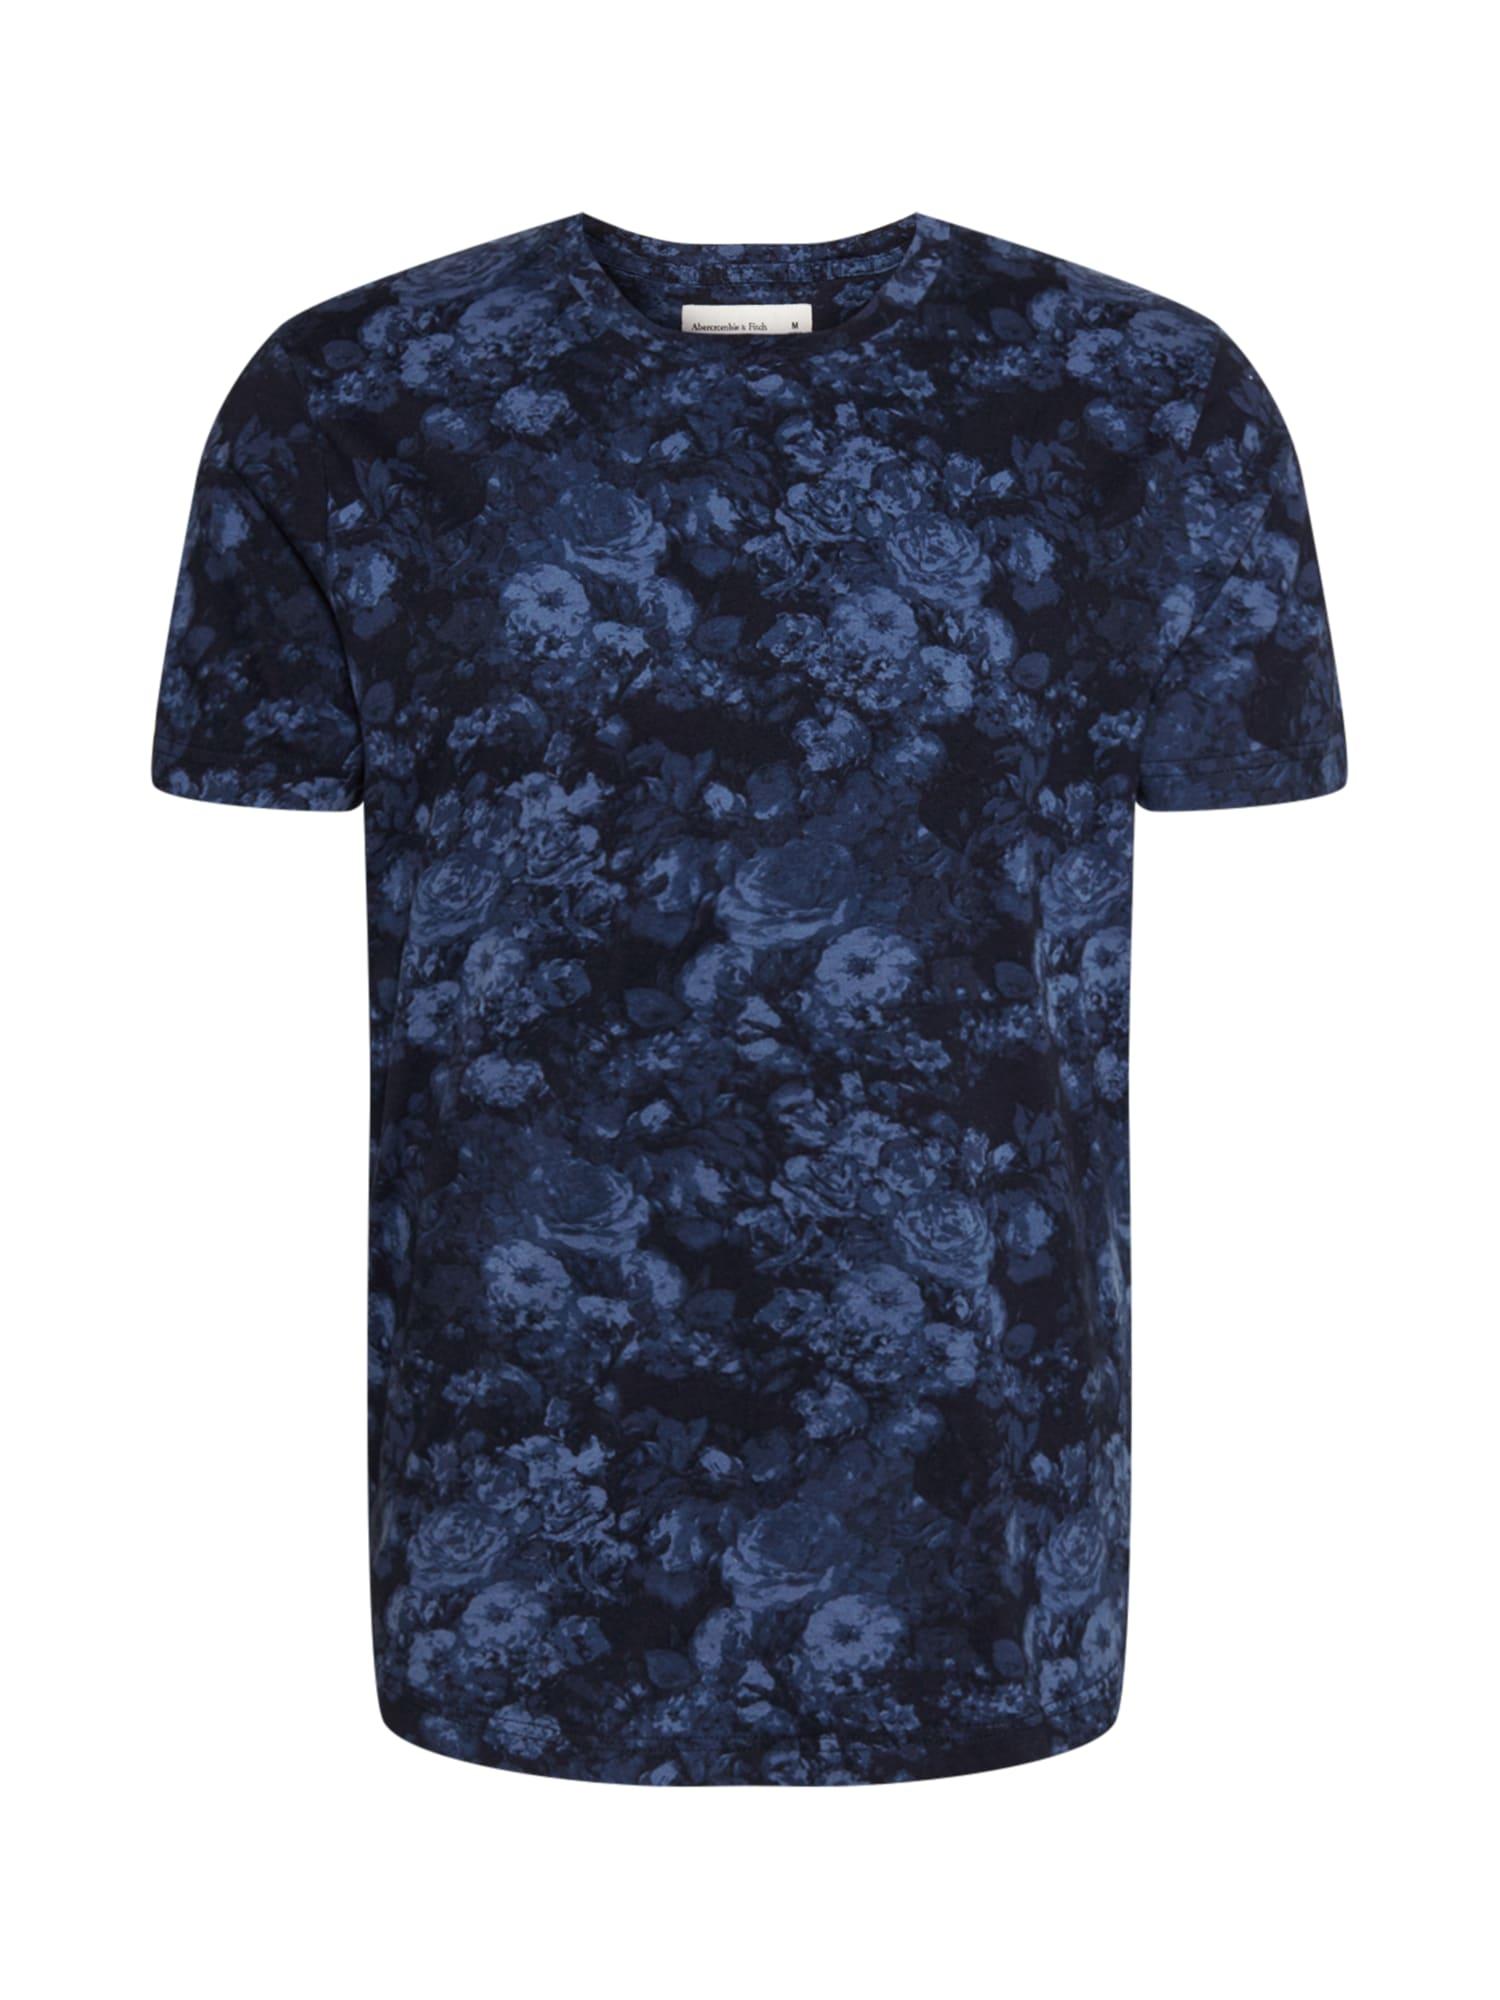 Abercrombie & Fitch Marškinėliai tamsiai mėlyna / mėlyna dūmų spalva